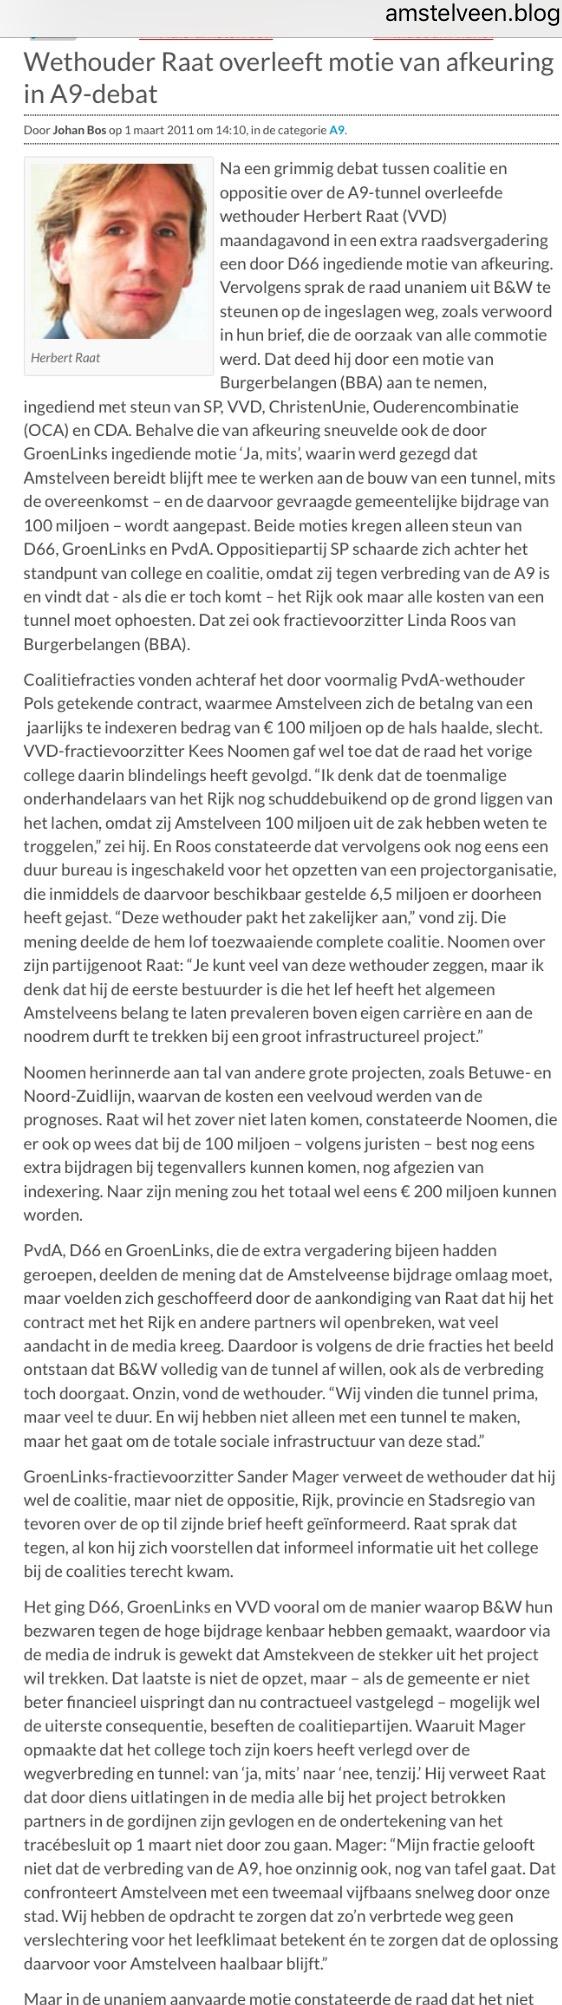 2011-1 maart Amstelveenblog.nl verslag raadsvergadering A9